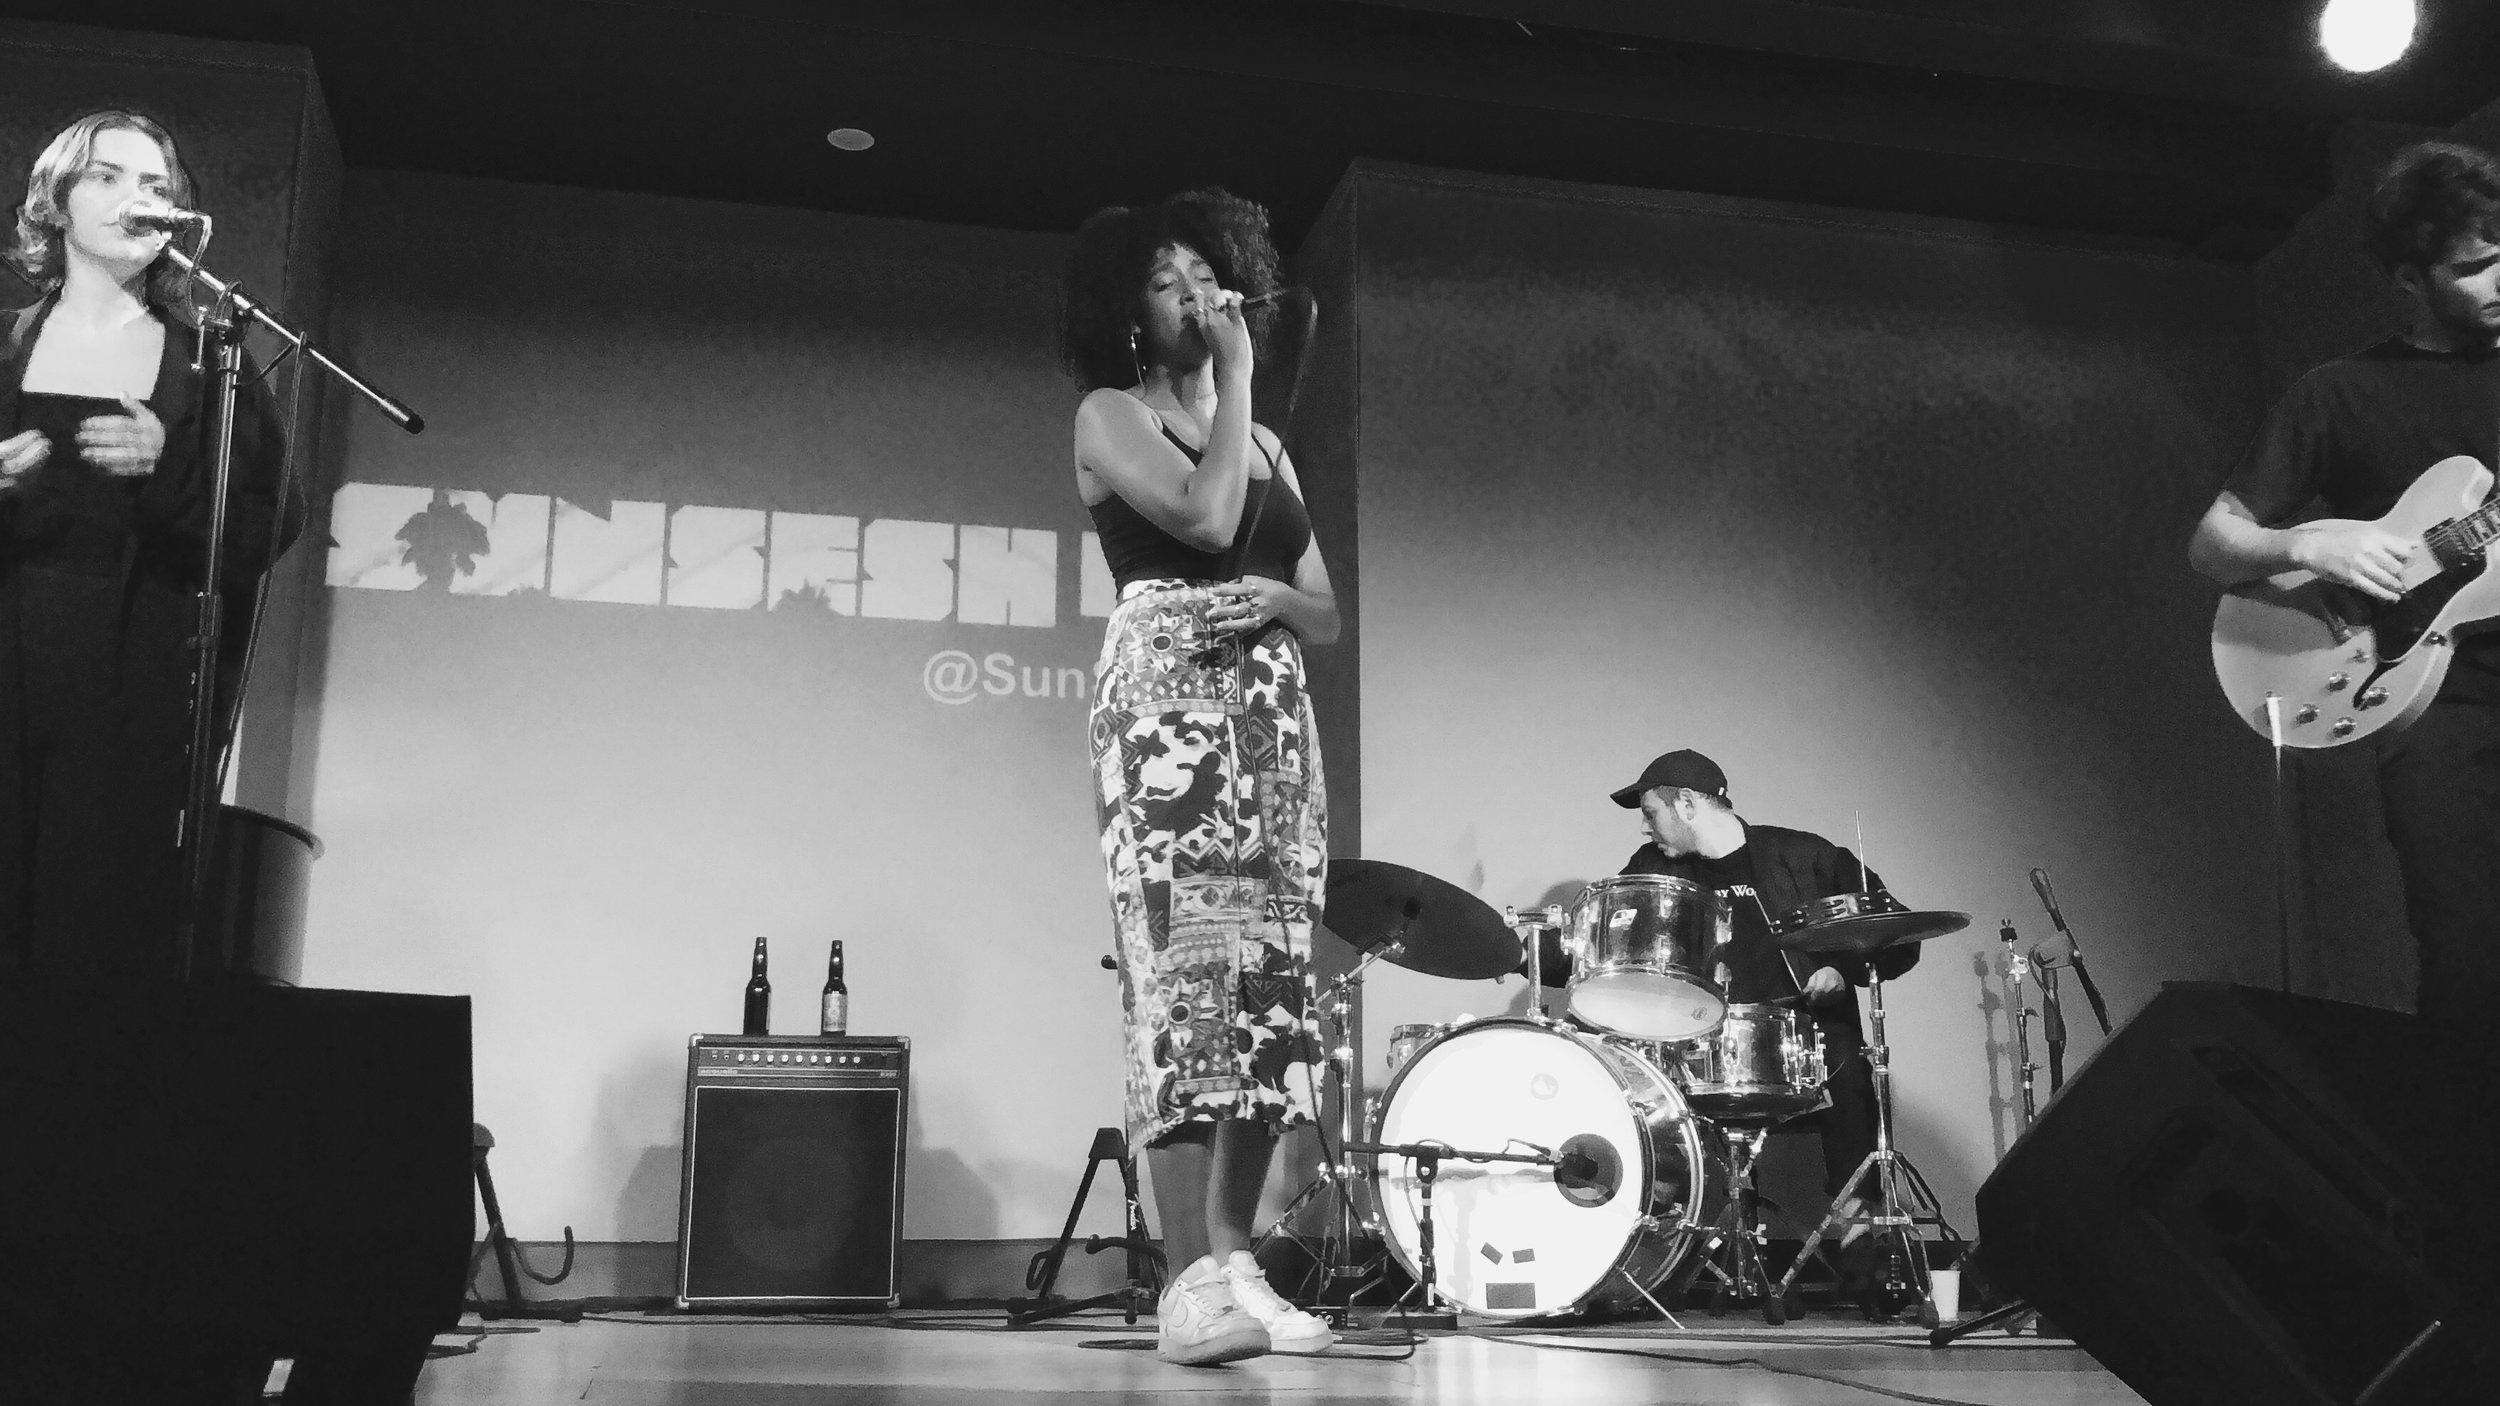 11/20/2017  SUNSESH LA  Los Angeles, CA